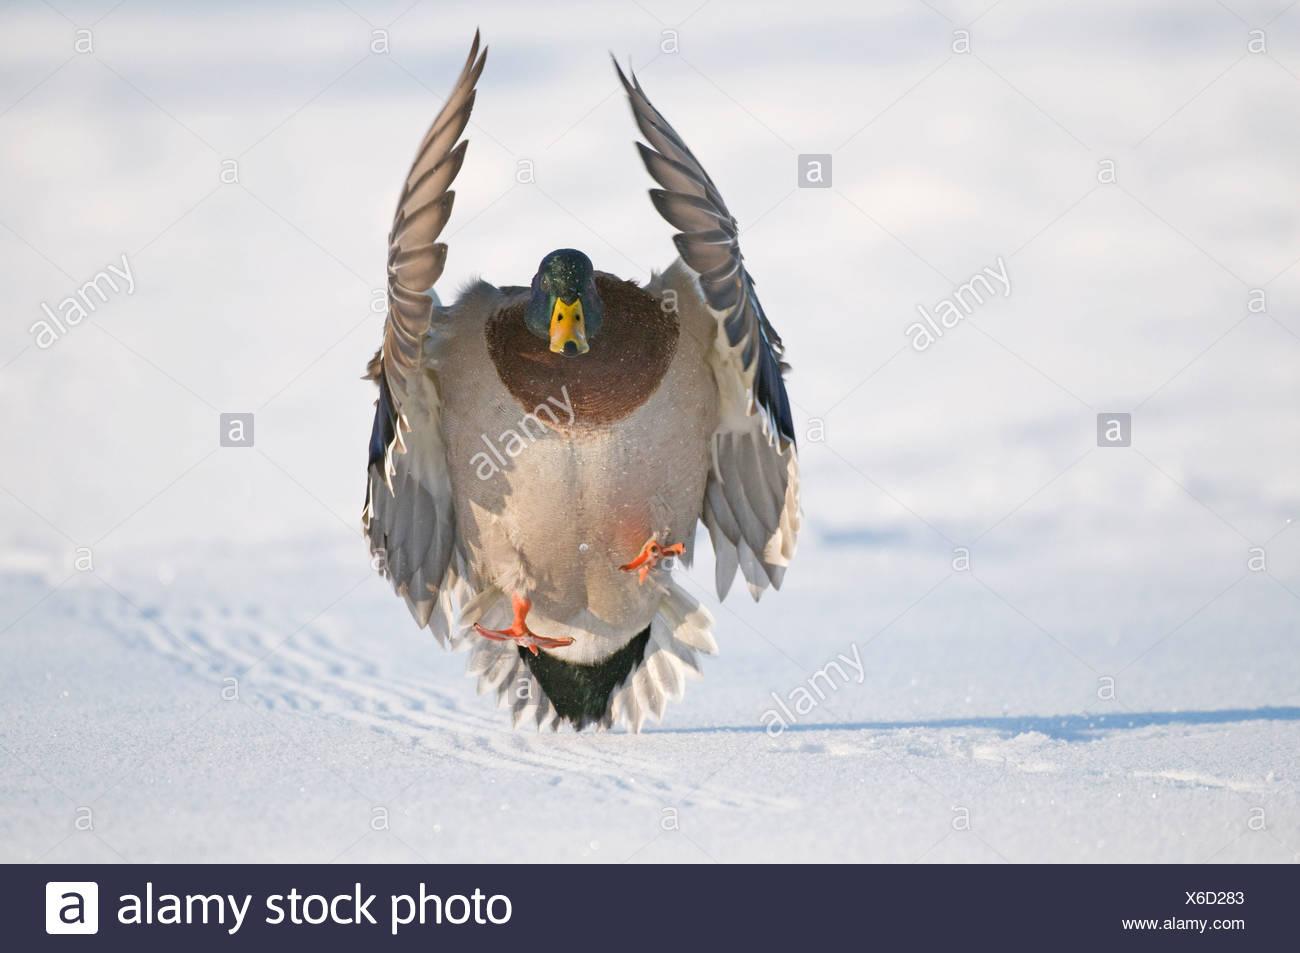 Mallard drake with wings extended lands in snow near Chena River, Fairbanks, Interior Alaska, Winter, Digitally Altered Stock Photo